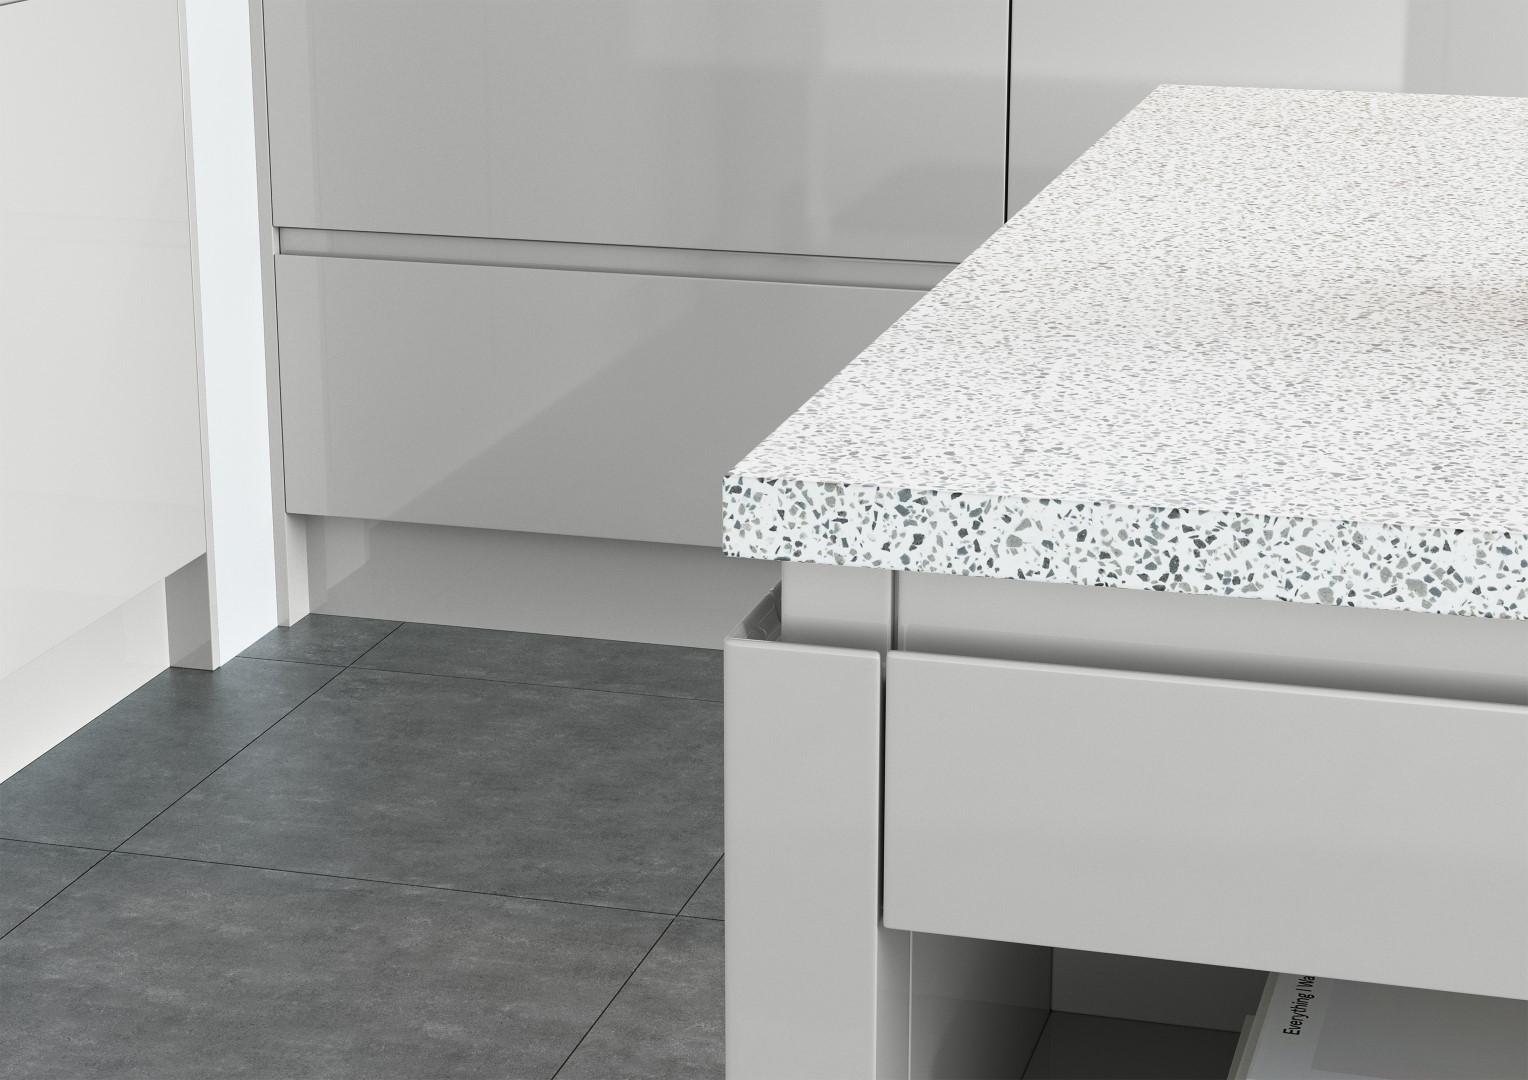 Strada Gloss Light Grey - Kitchen Design - Alan Kelly Kitchens - Waterford - 3